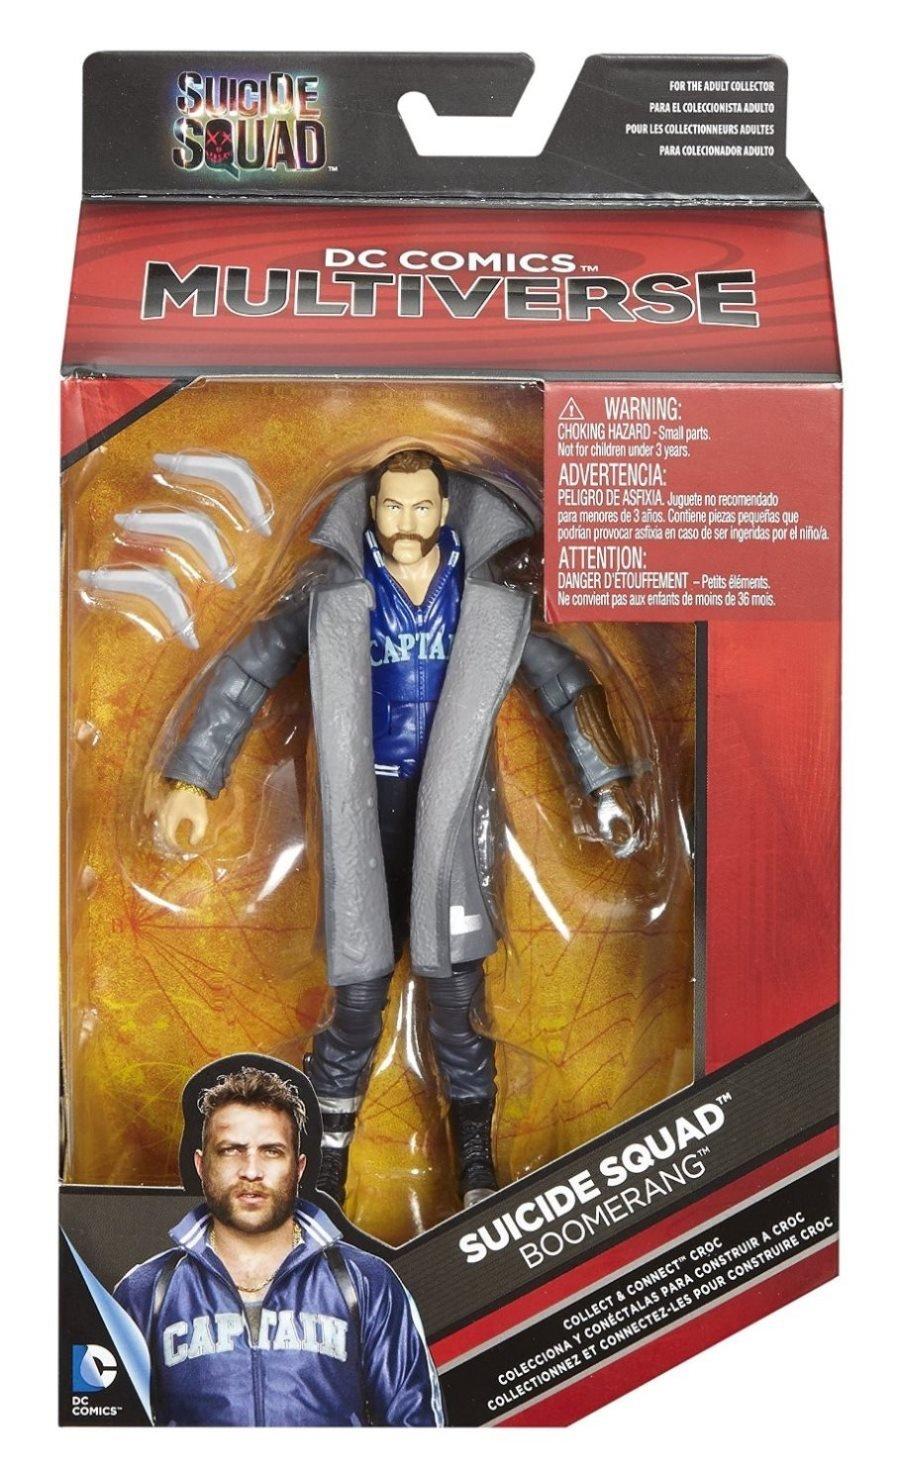 Mattel Suicide Squad 6″ Captain Boomerang Figure For $6.95 On Amazon